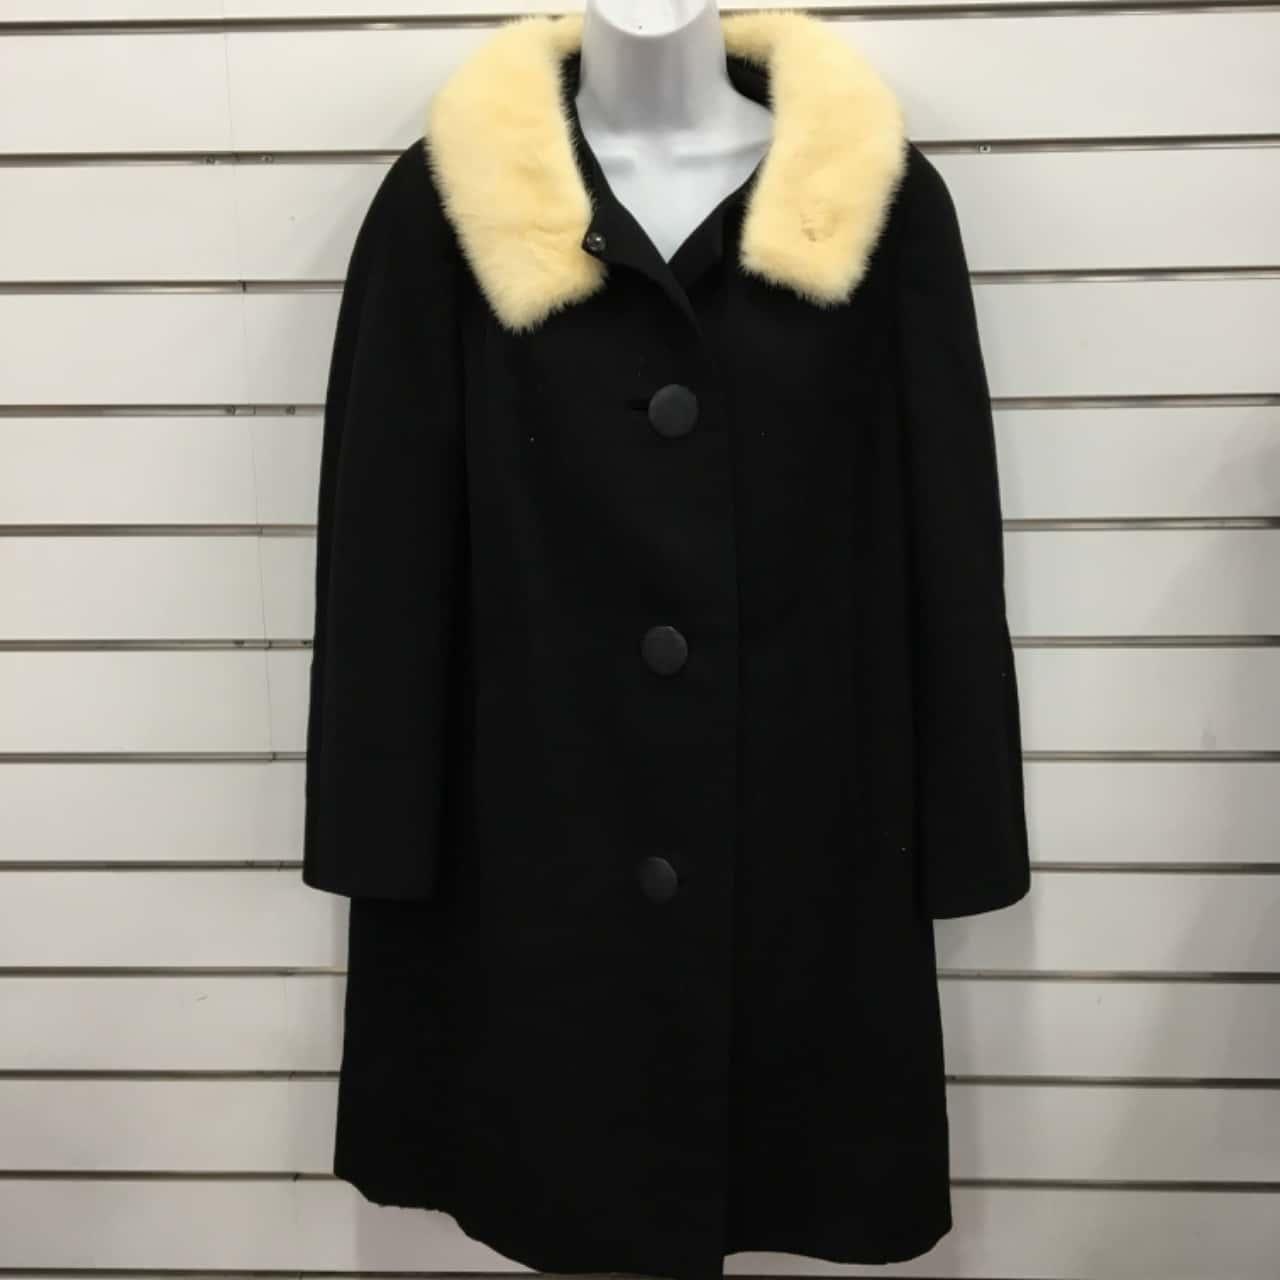 Pacific Fashions Womens Heavy Overcoat Black